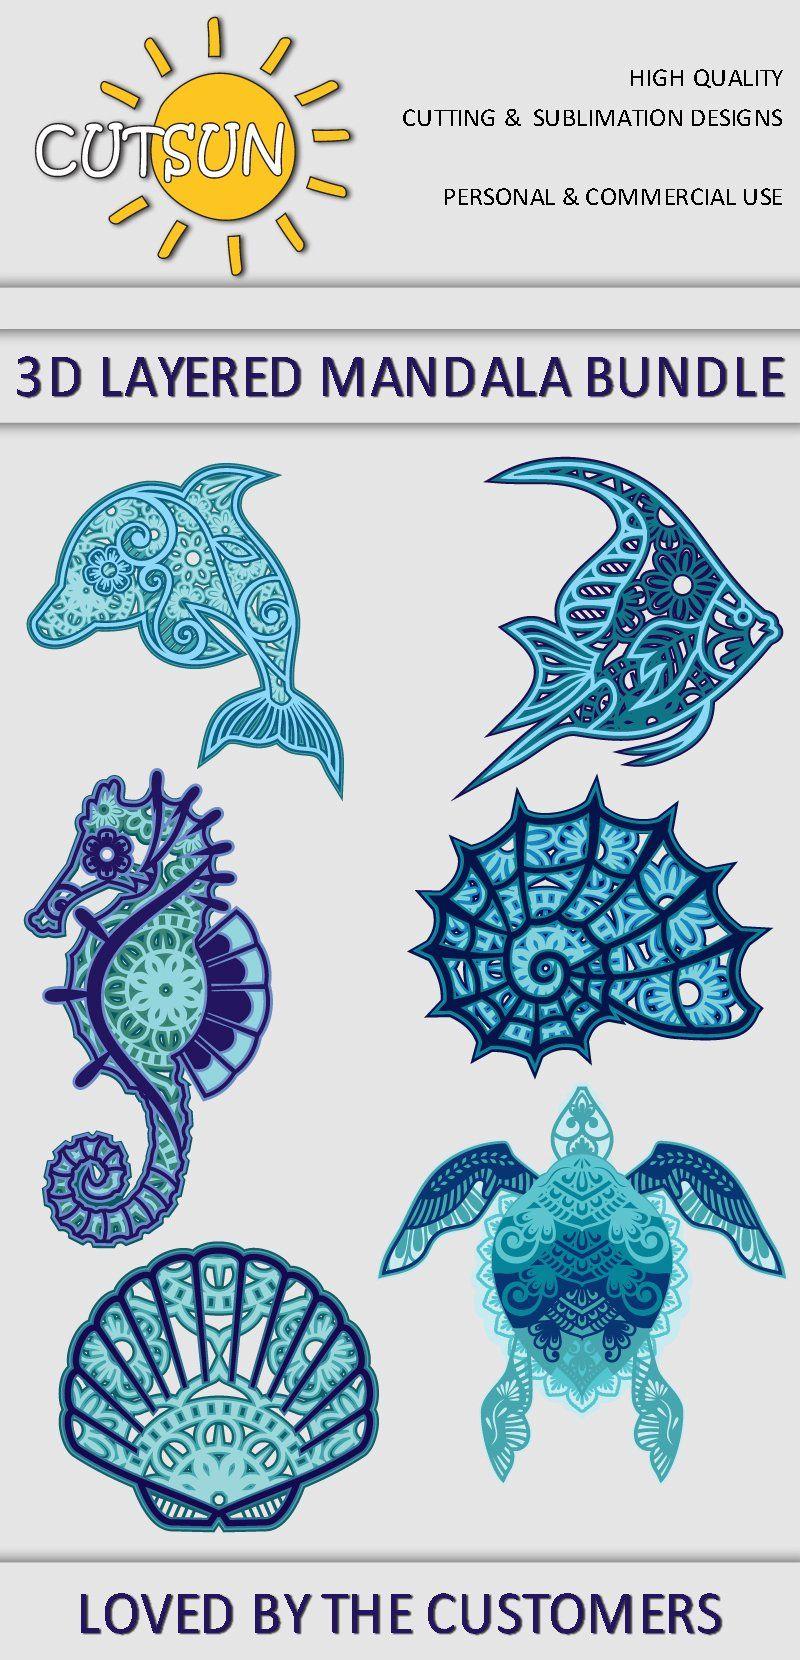 Download 3d Layered Mandala Sea Creatures Svg Bundle Layeredsvg Layeredmandalasvg Multilayeredmandalasvg Seasvg Nautical In 2020 Mandala Vinyl Decal Projects Sea Creatures